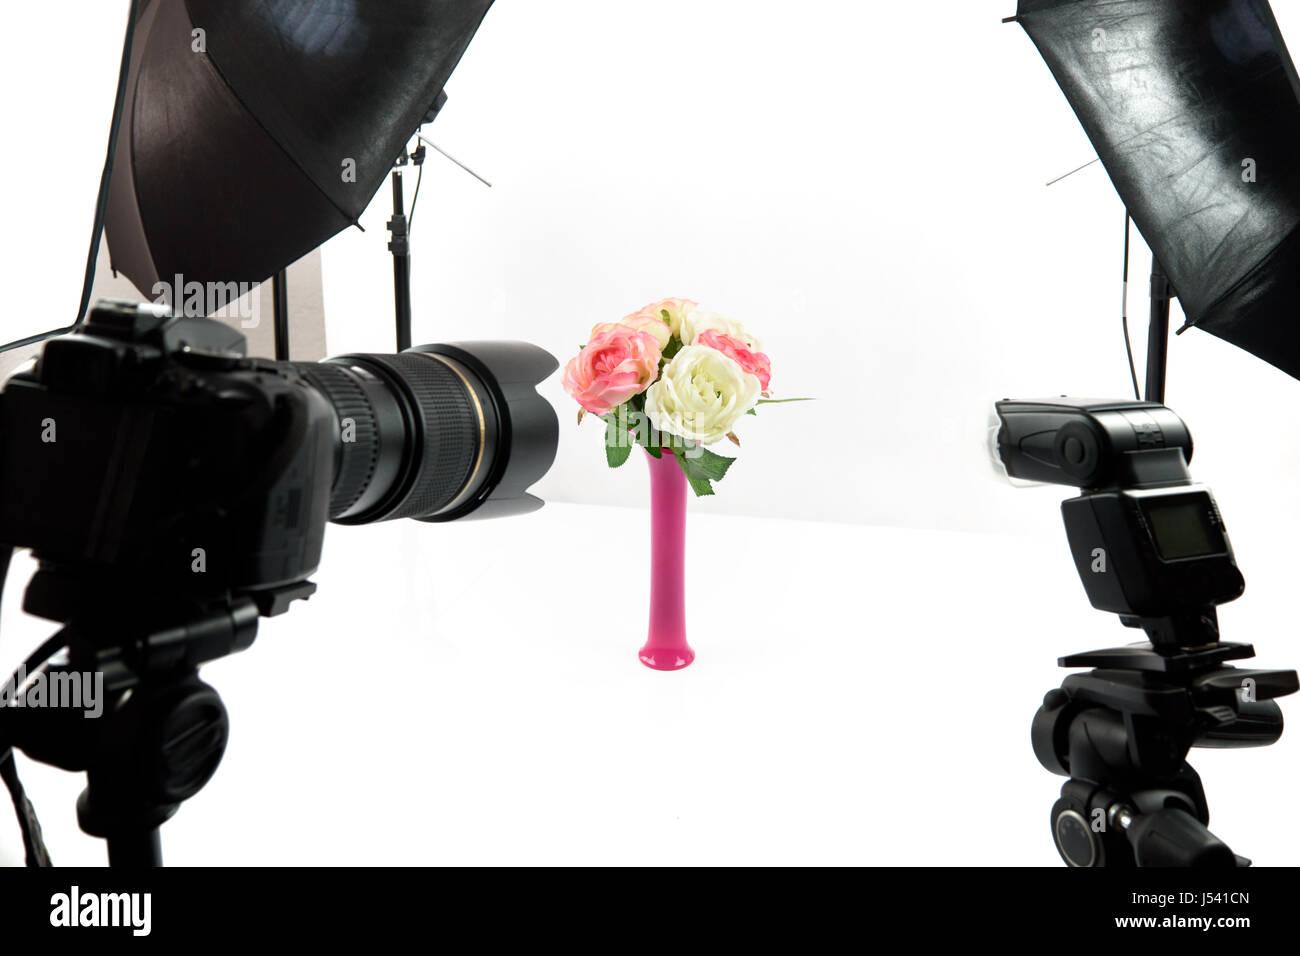 Interior of professional photo studio while shooting lifestyle decoration - Stock Image